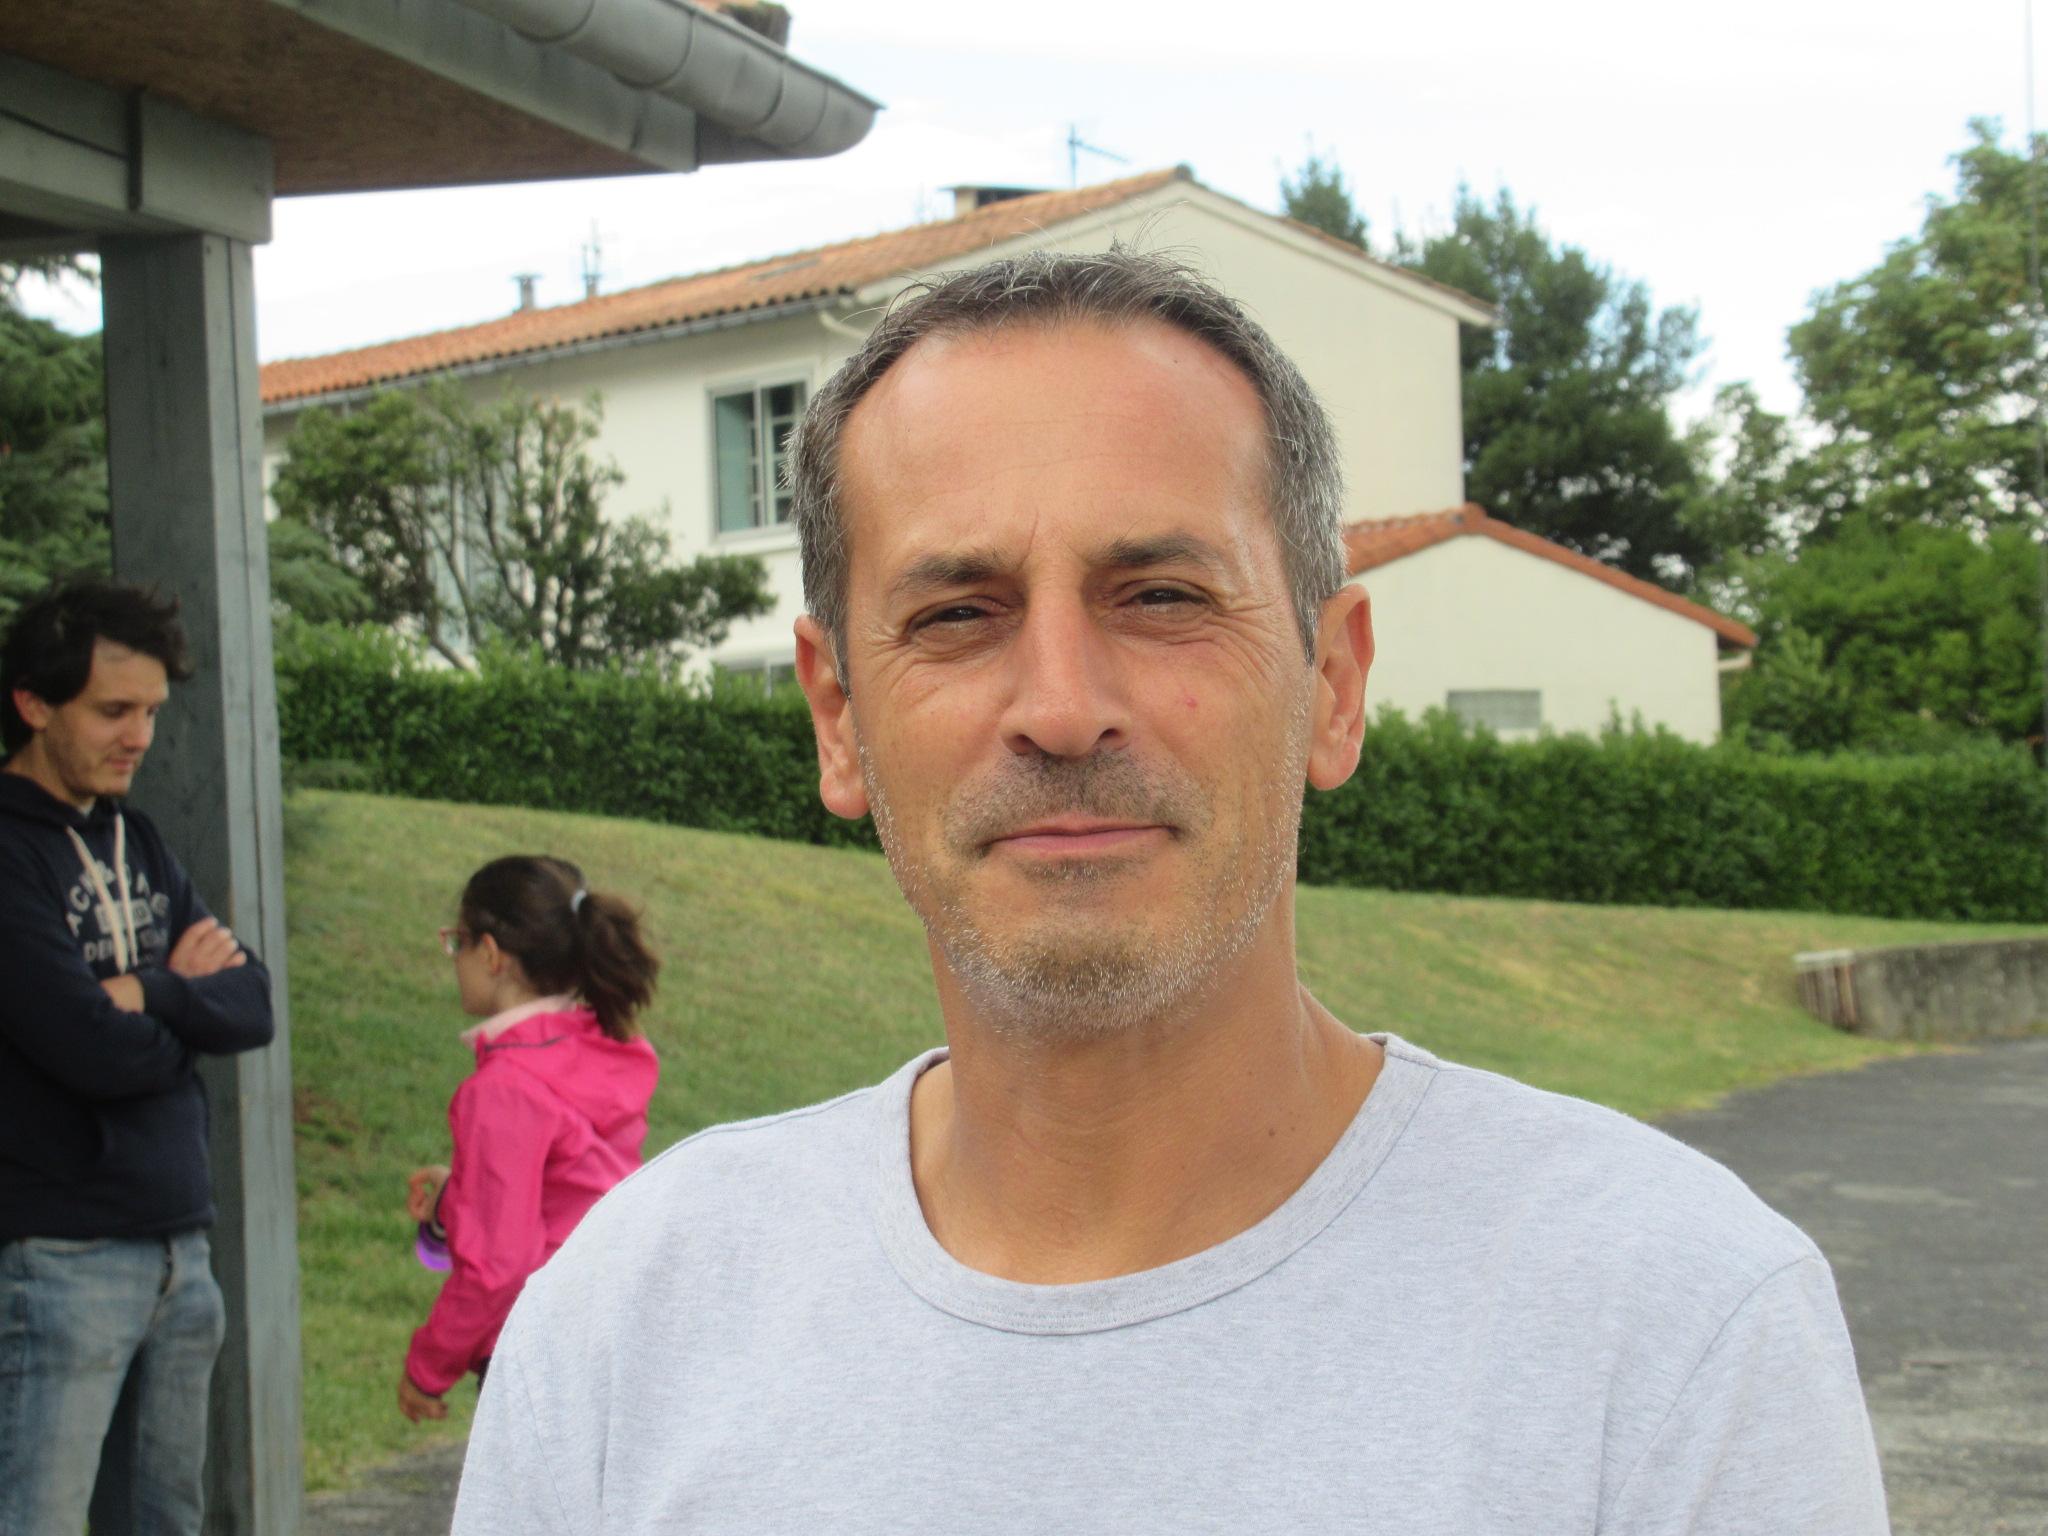 Jean-Claude CALAMOTE